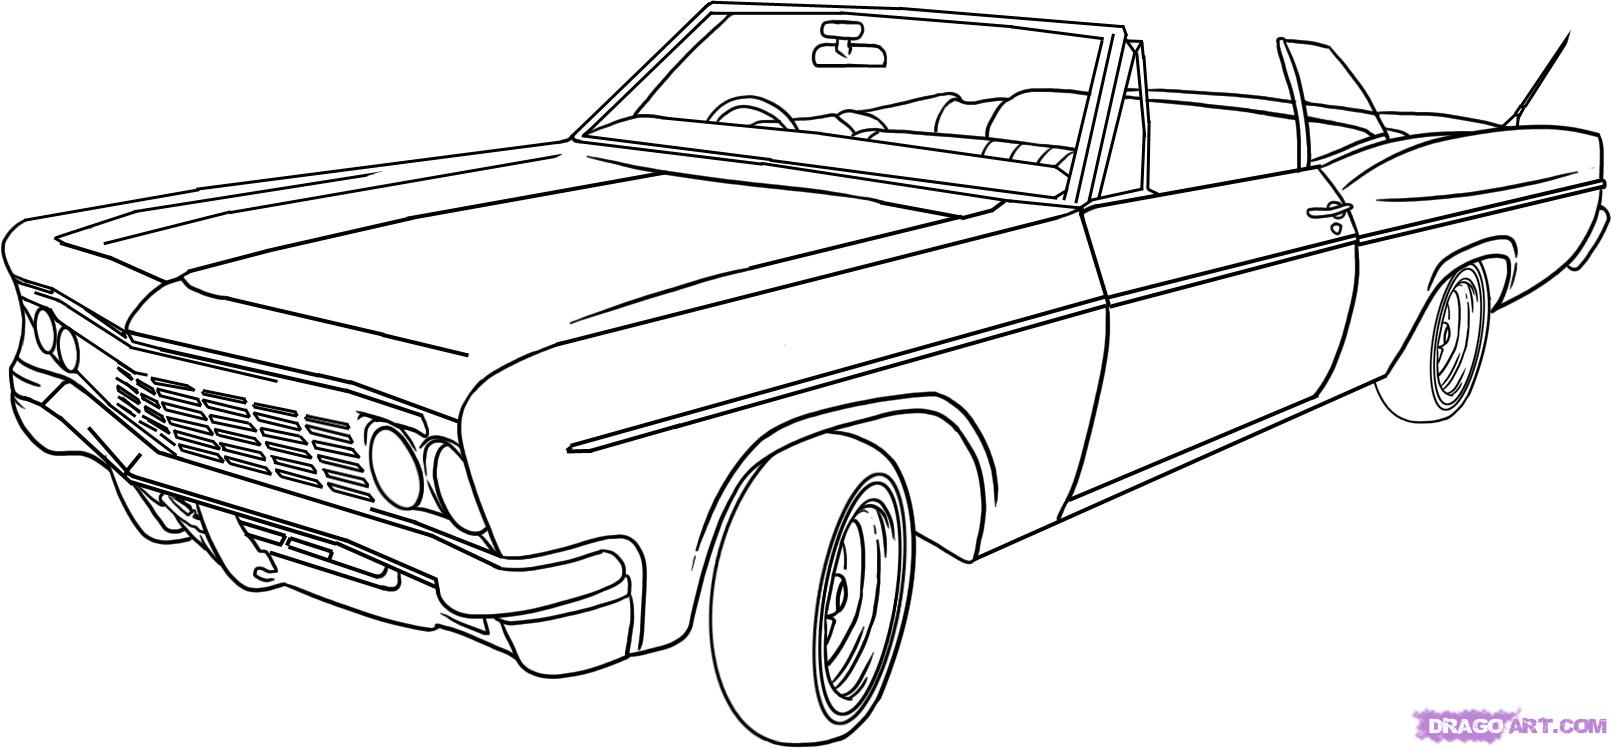 1612x748 Drawn Truck Lowrider Car